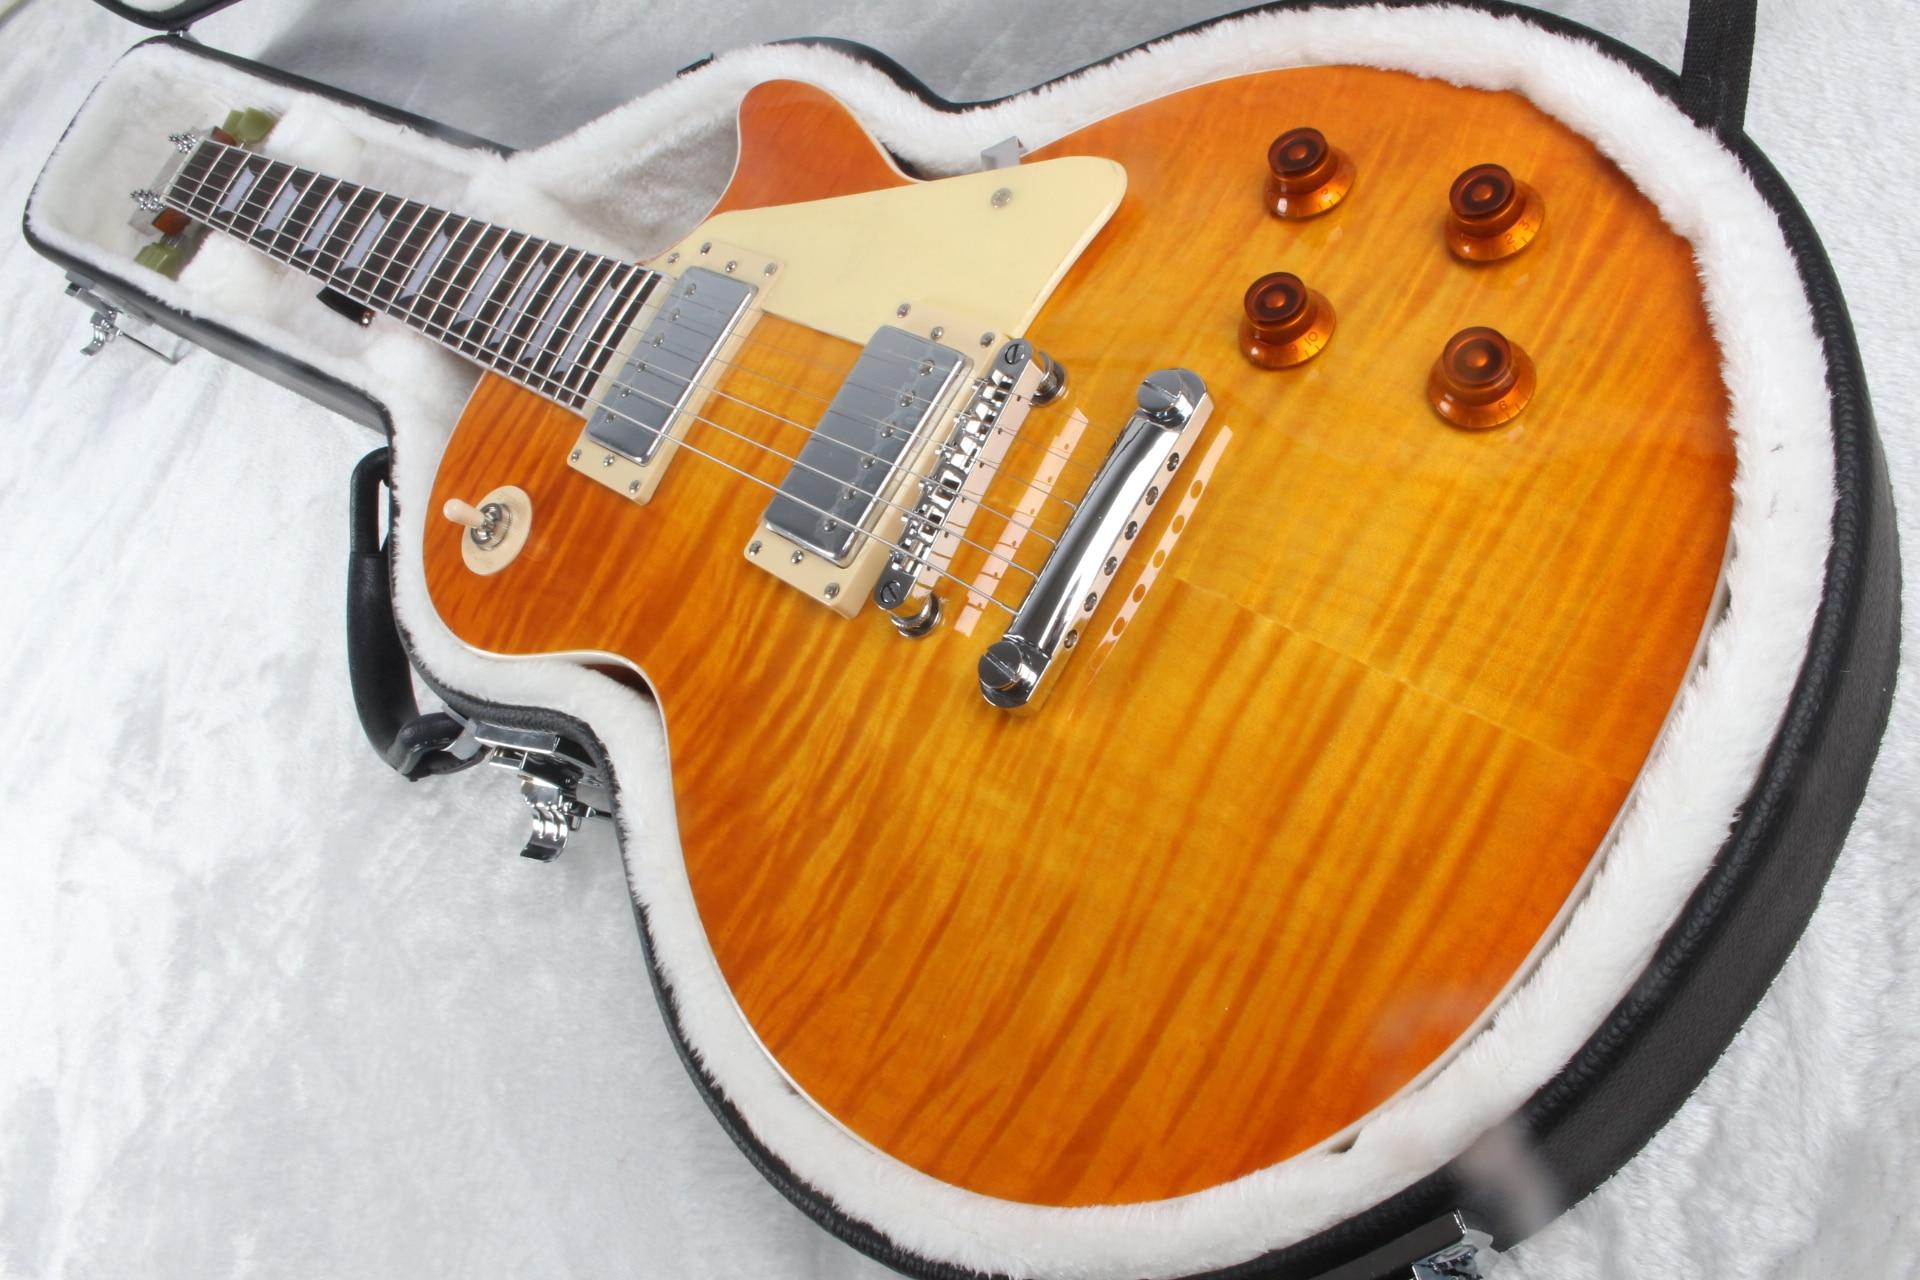 honey burst guitar six-string electric guitar plated hardware, factory customization